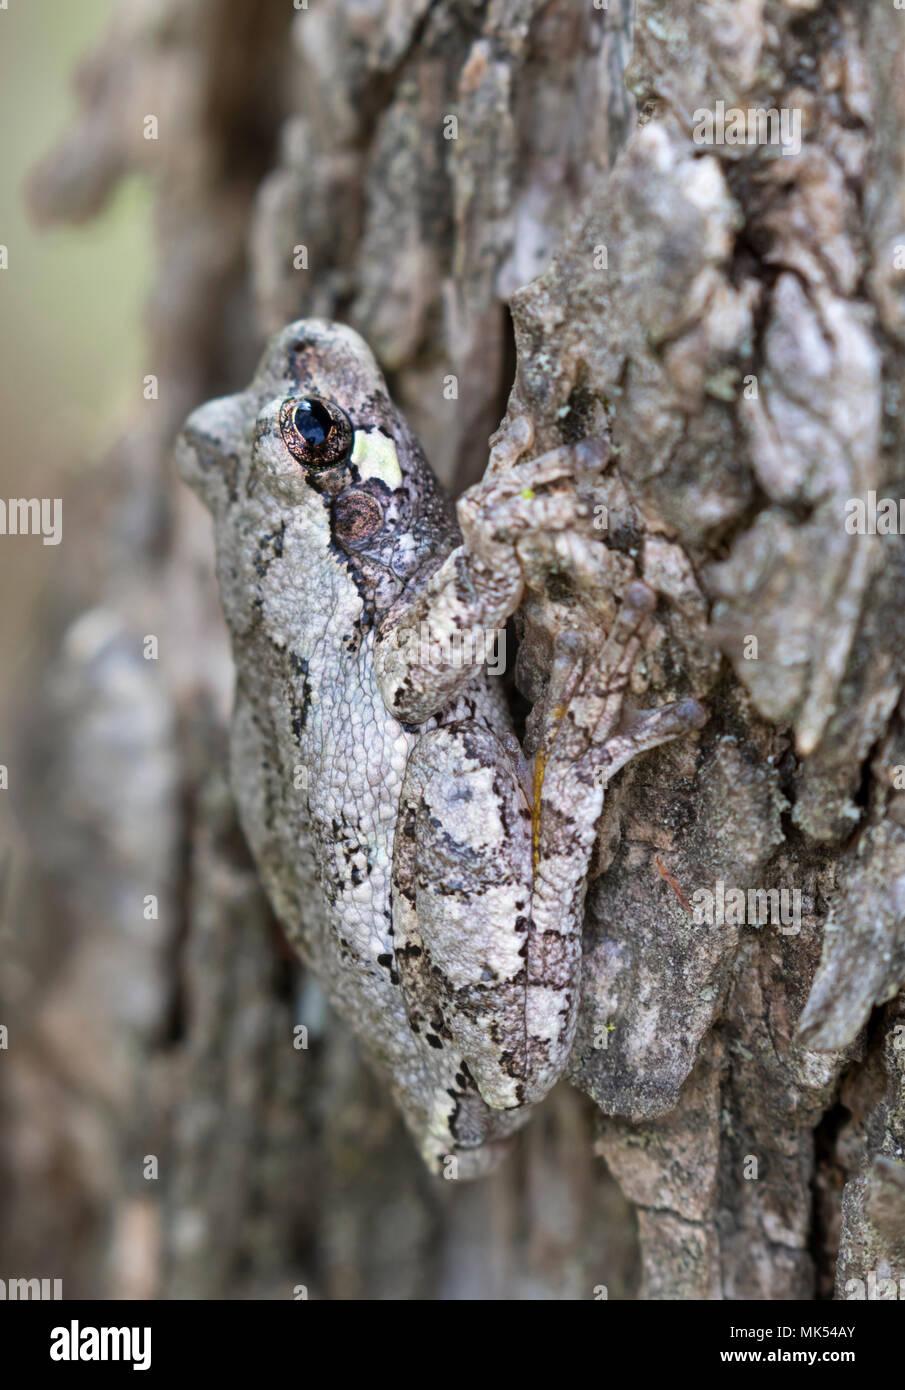 Gray treefrog (Hyla versicolor) camouflaging on the bark of elm tree, Iowa, USA. - Stock Image